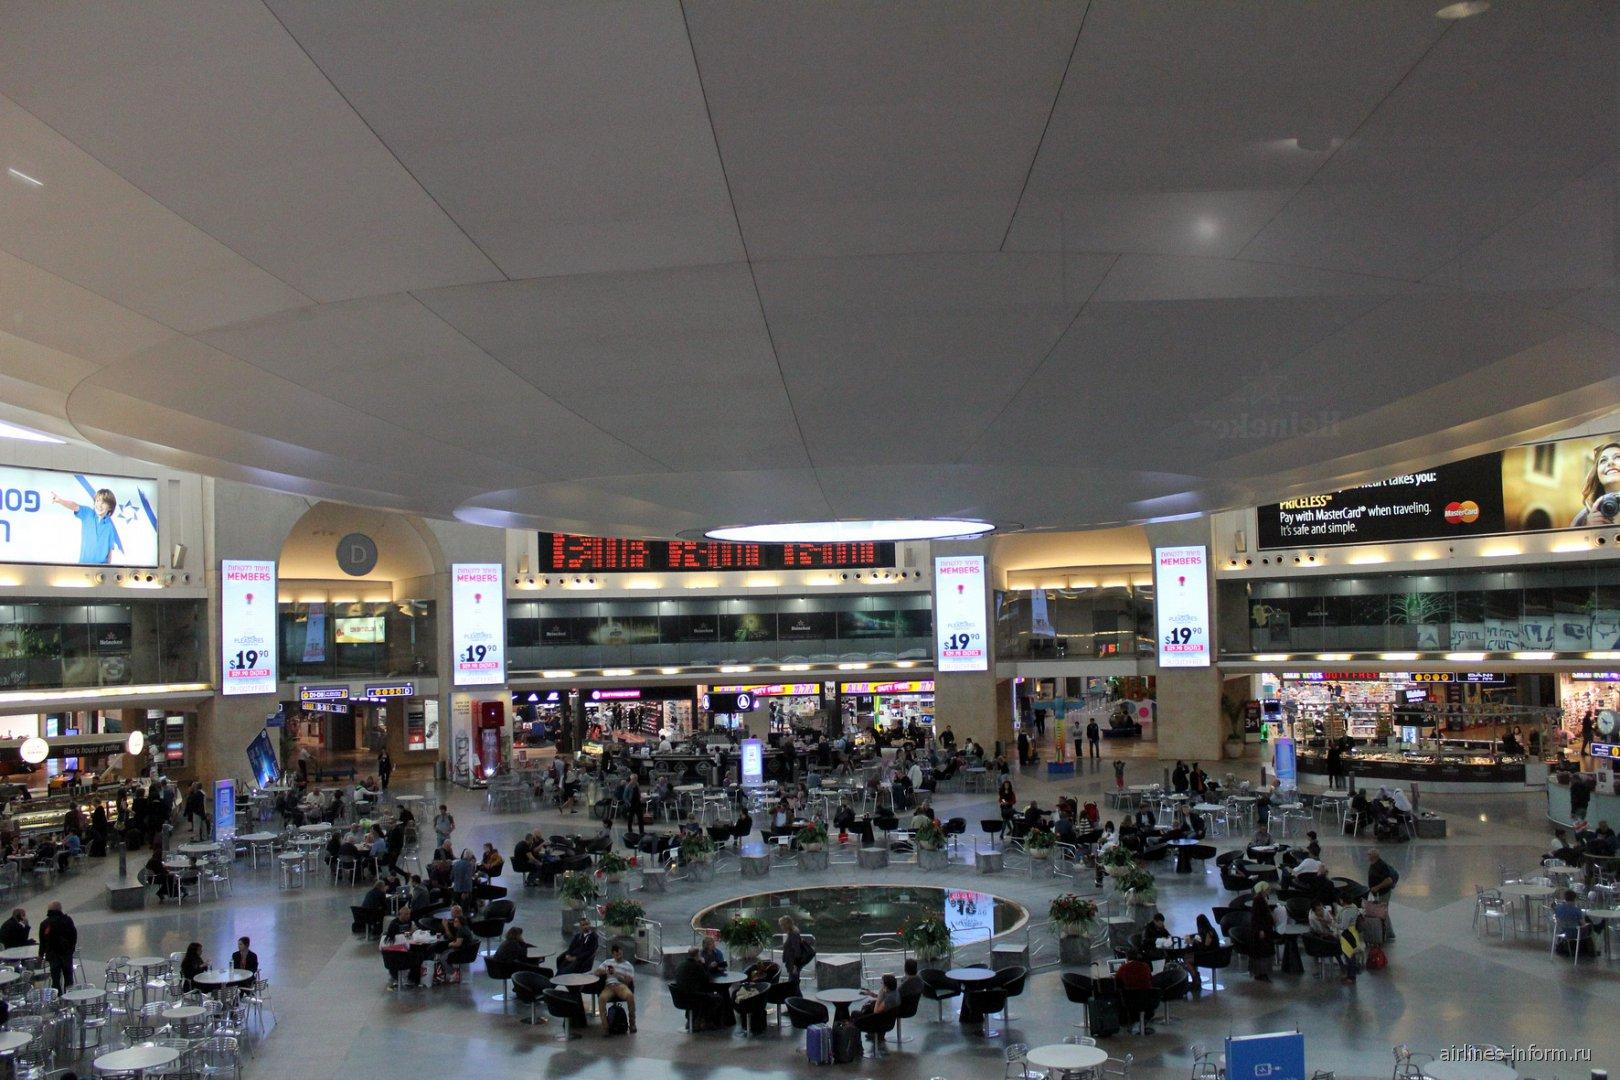 Чистая зона аэропорта Тель-Авив Бен-Гурион